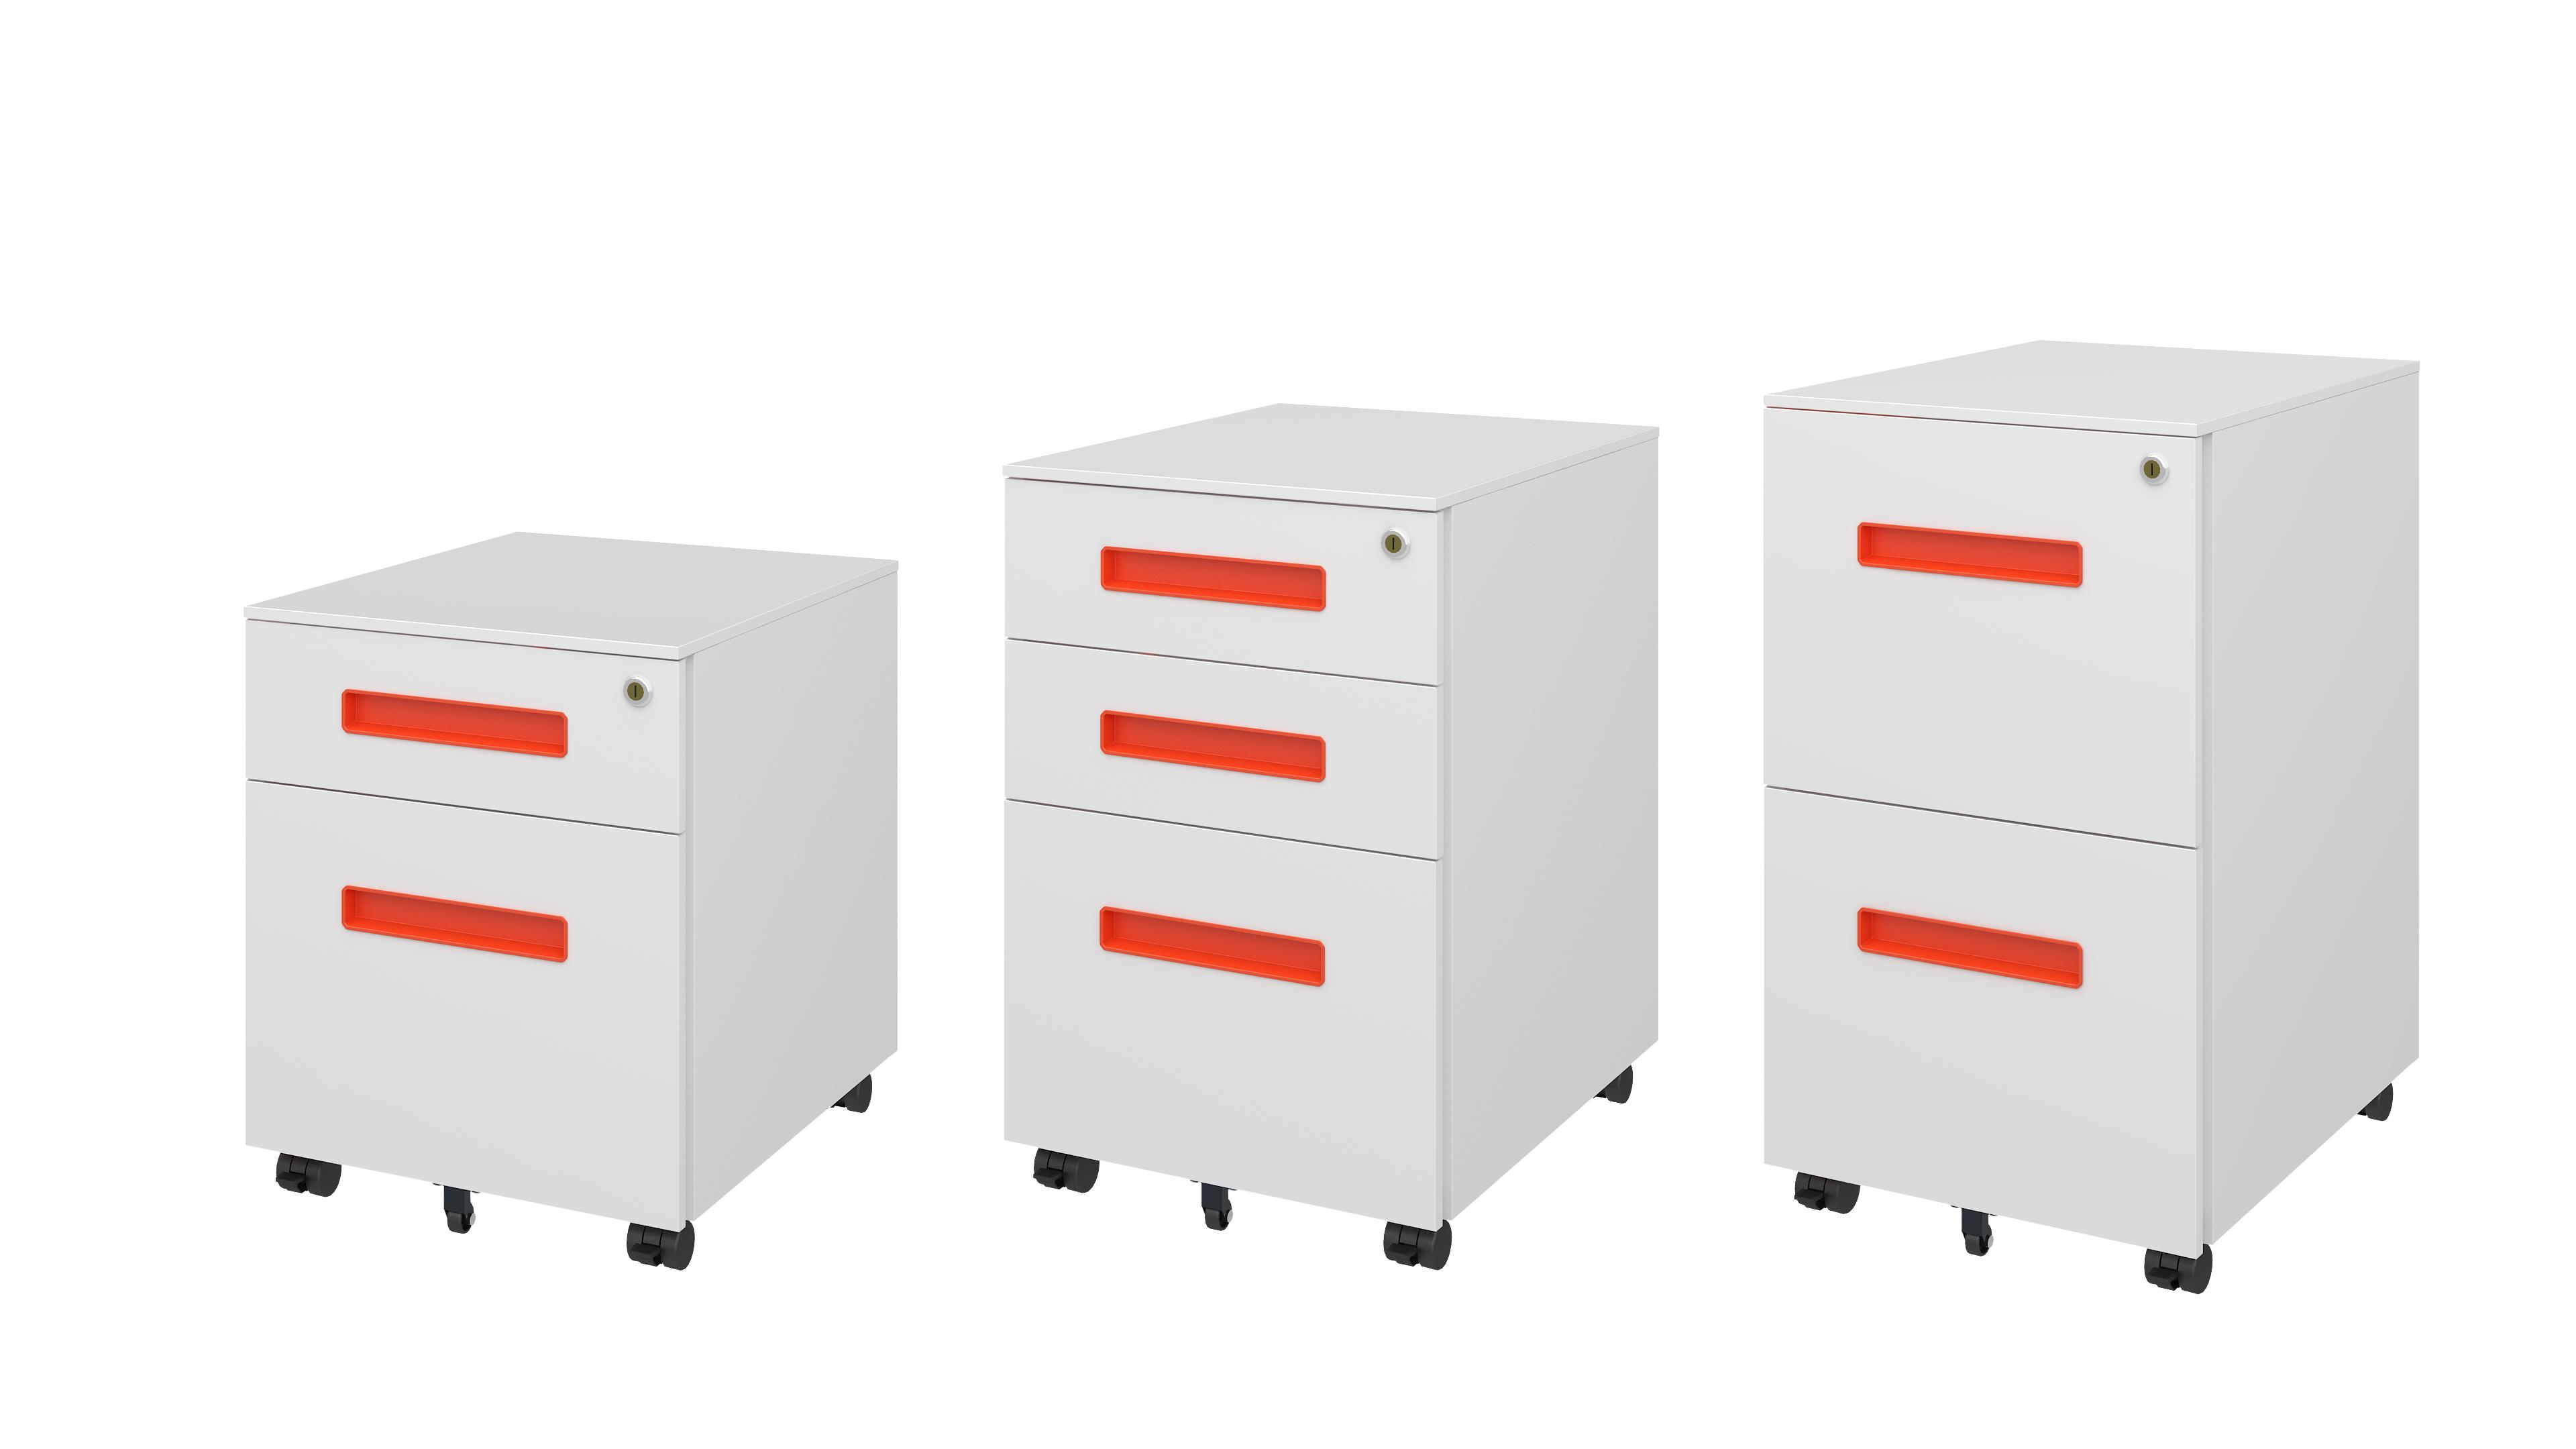 Pengcheng colorful metal file cabinet - PCP-390